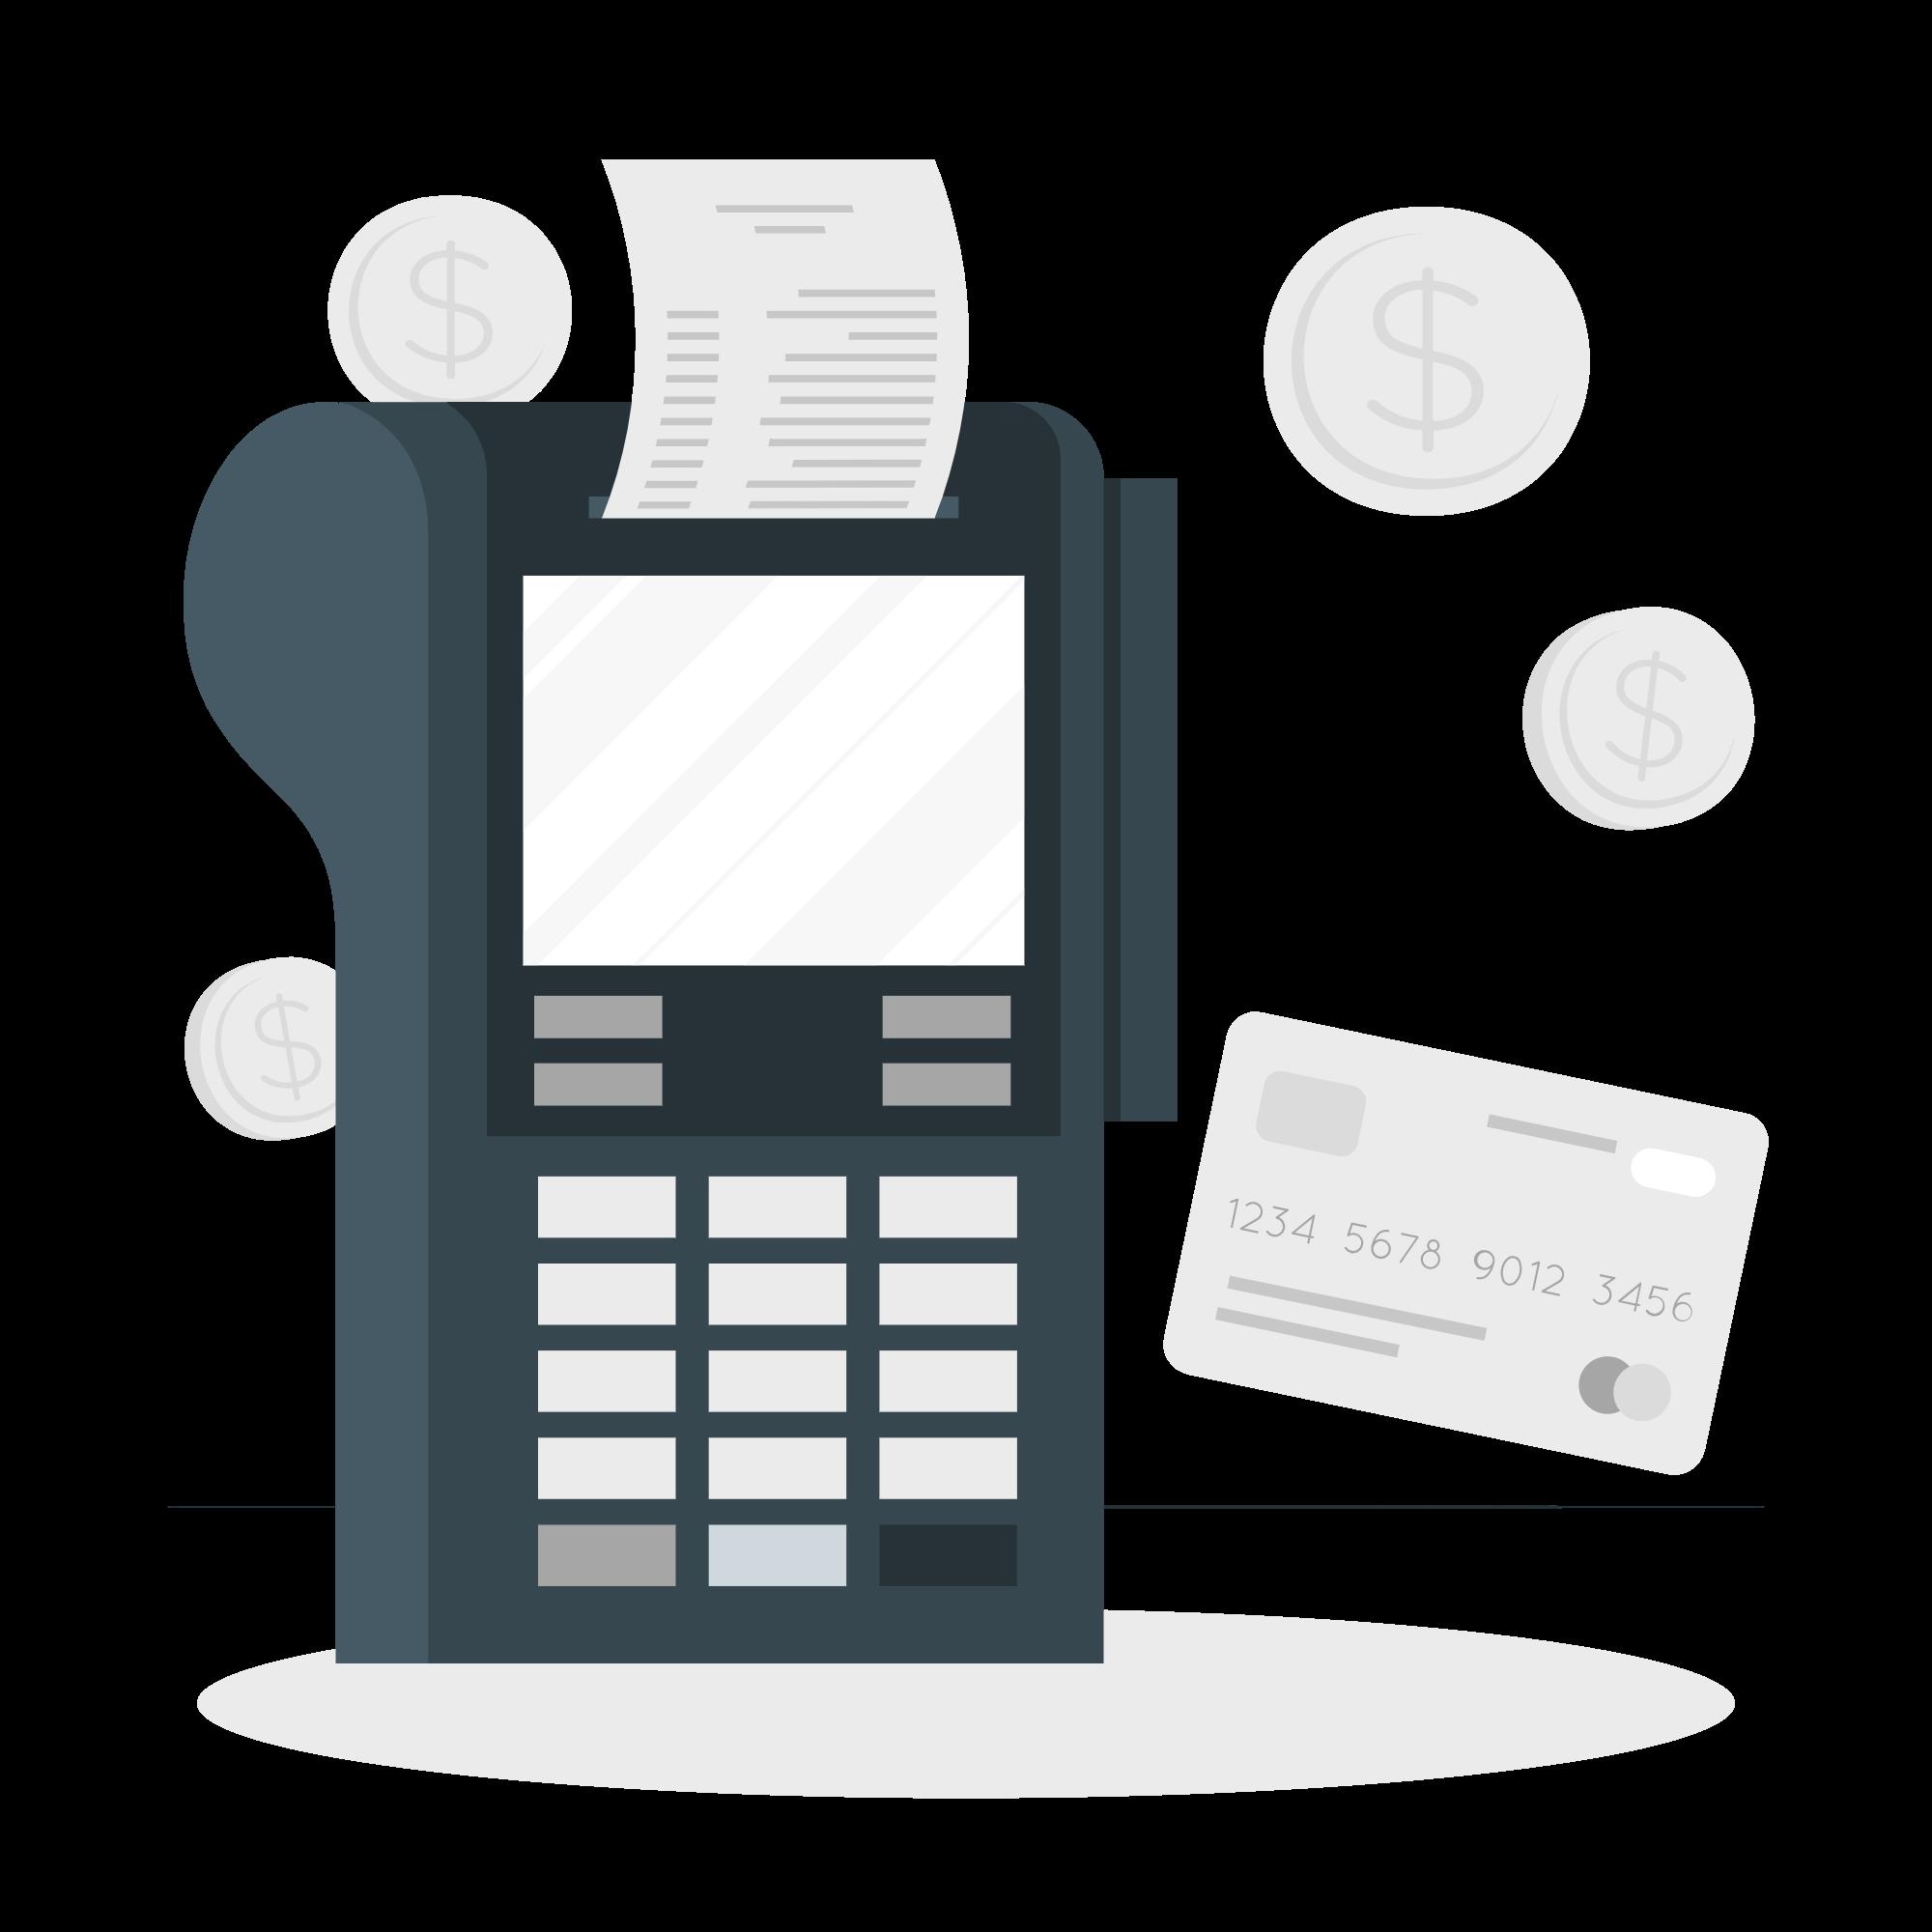 Plain credit card-cuate von storyset